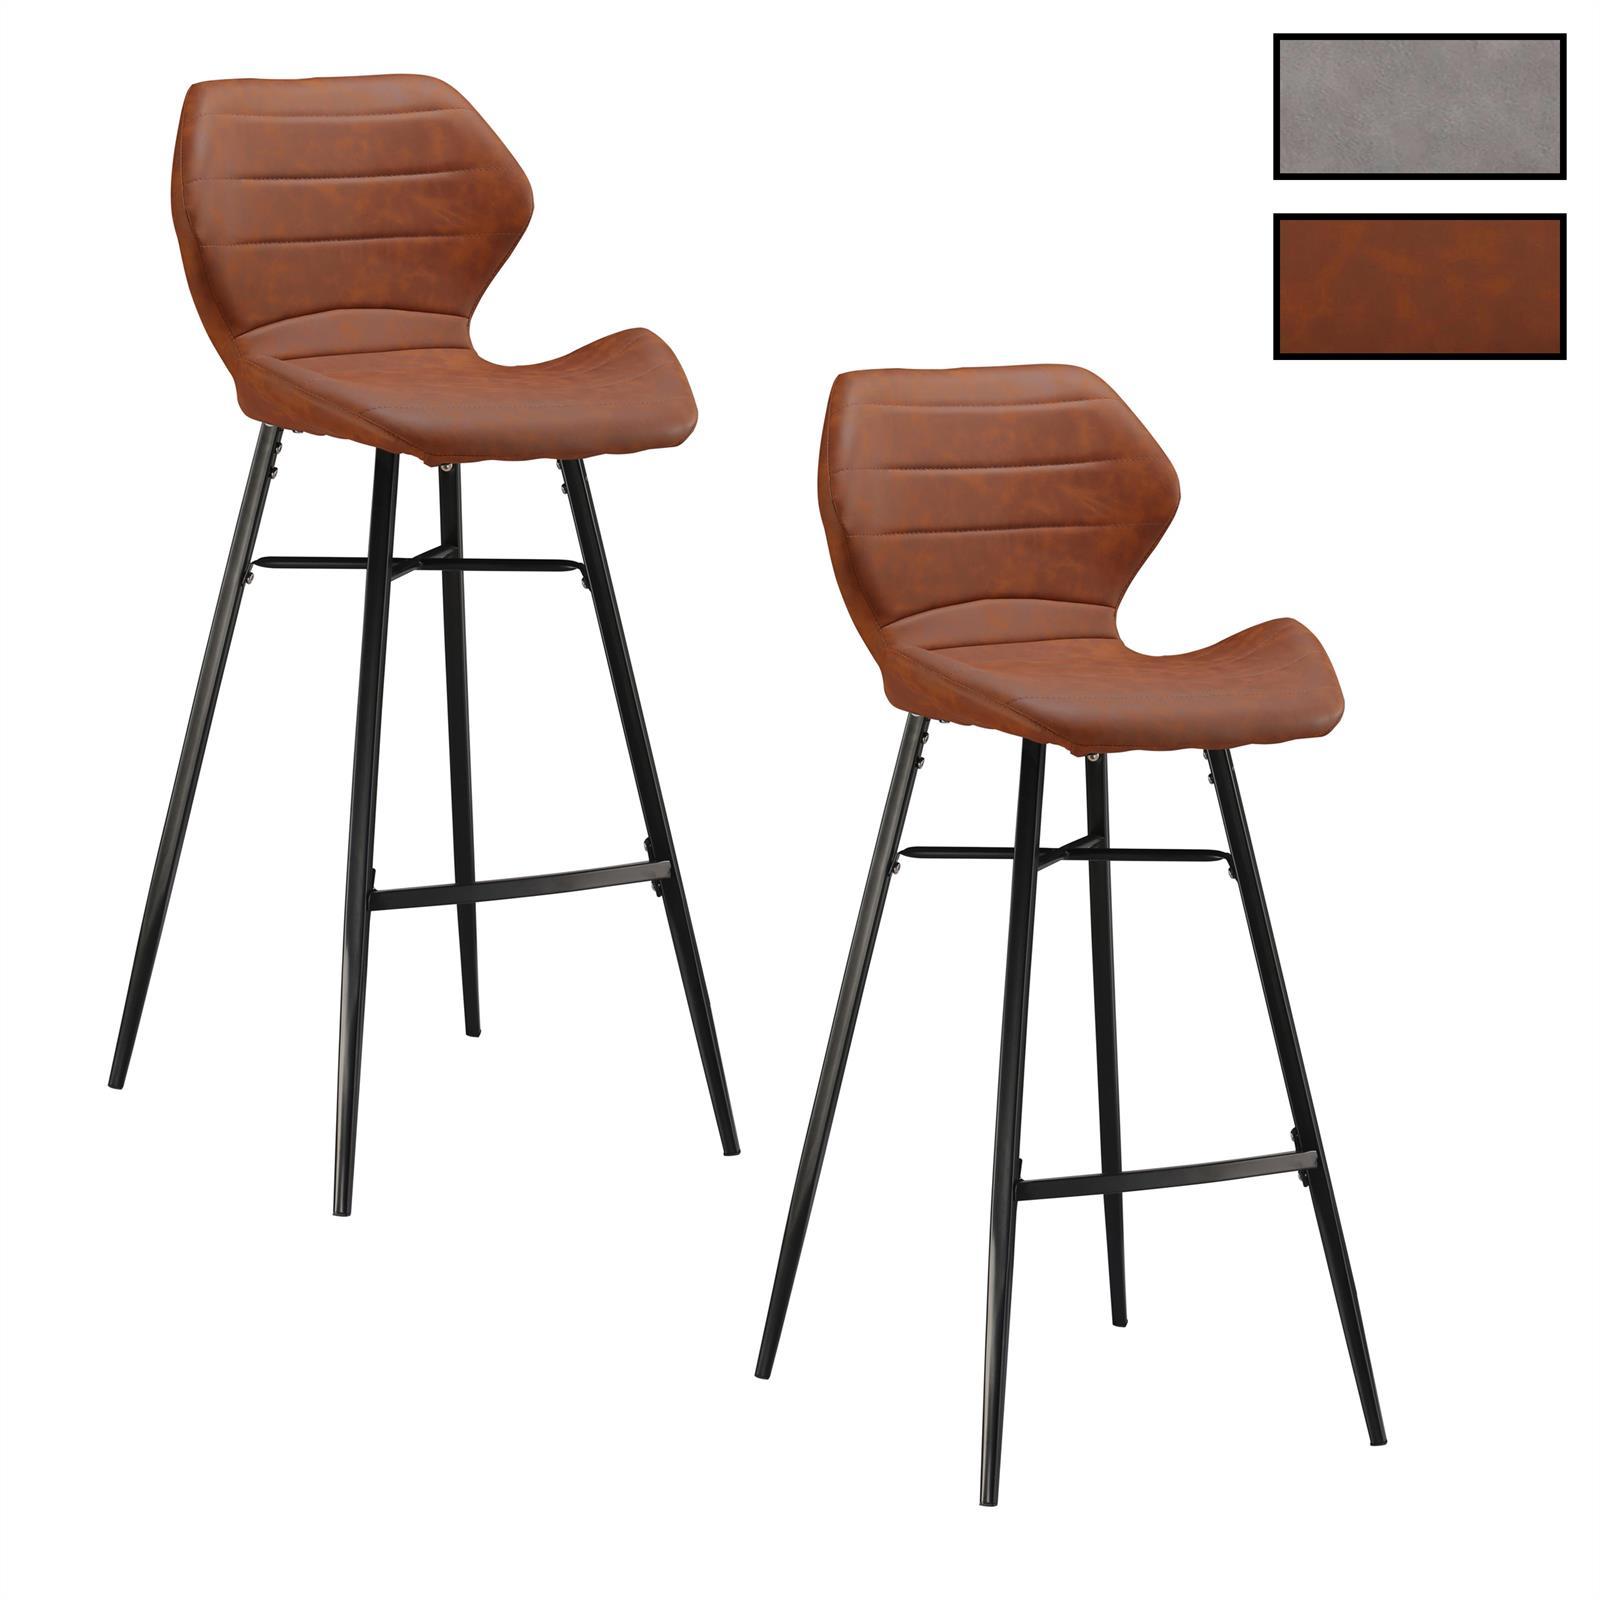 barhocker lamia in braun caro m bel. Black Bedroom Furniture Sets. Home Design Ideas